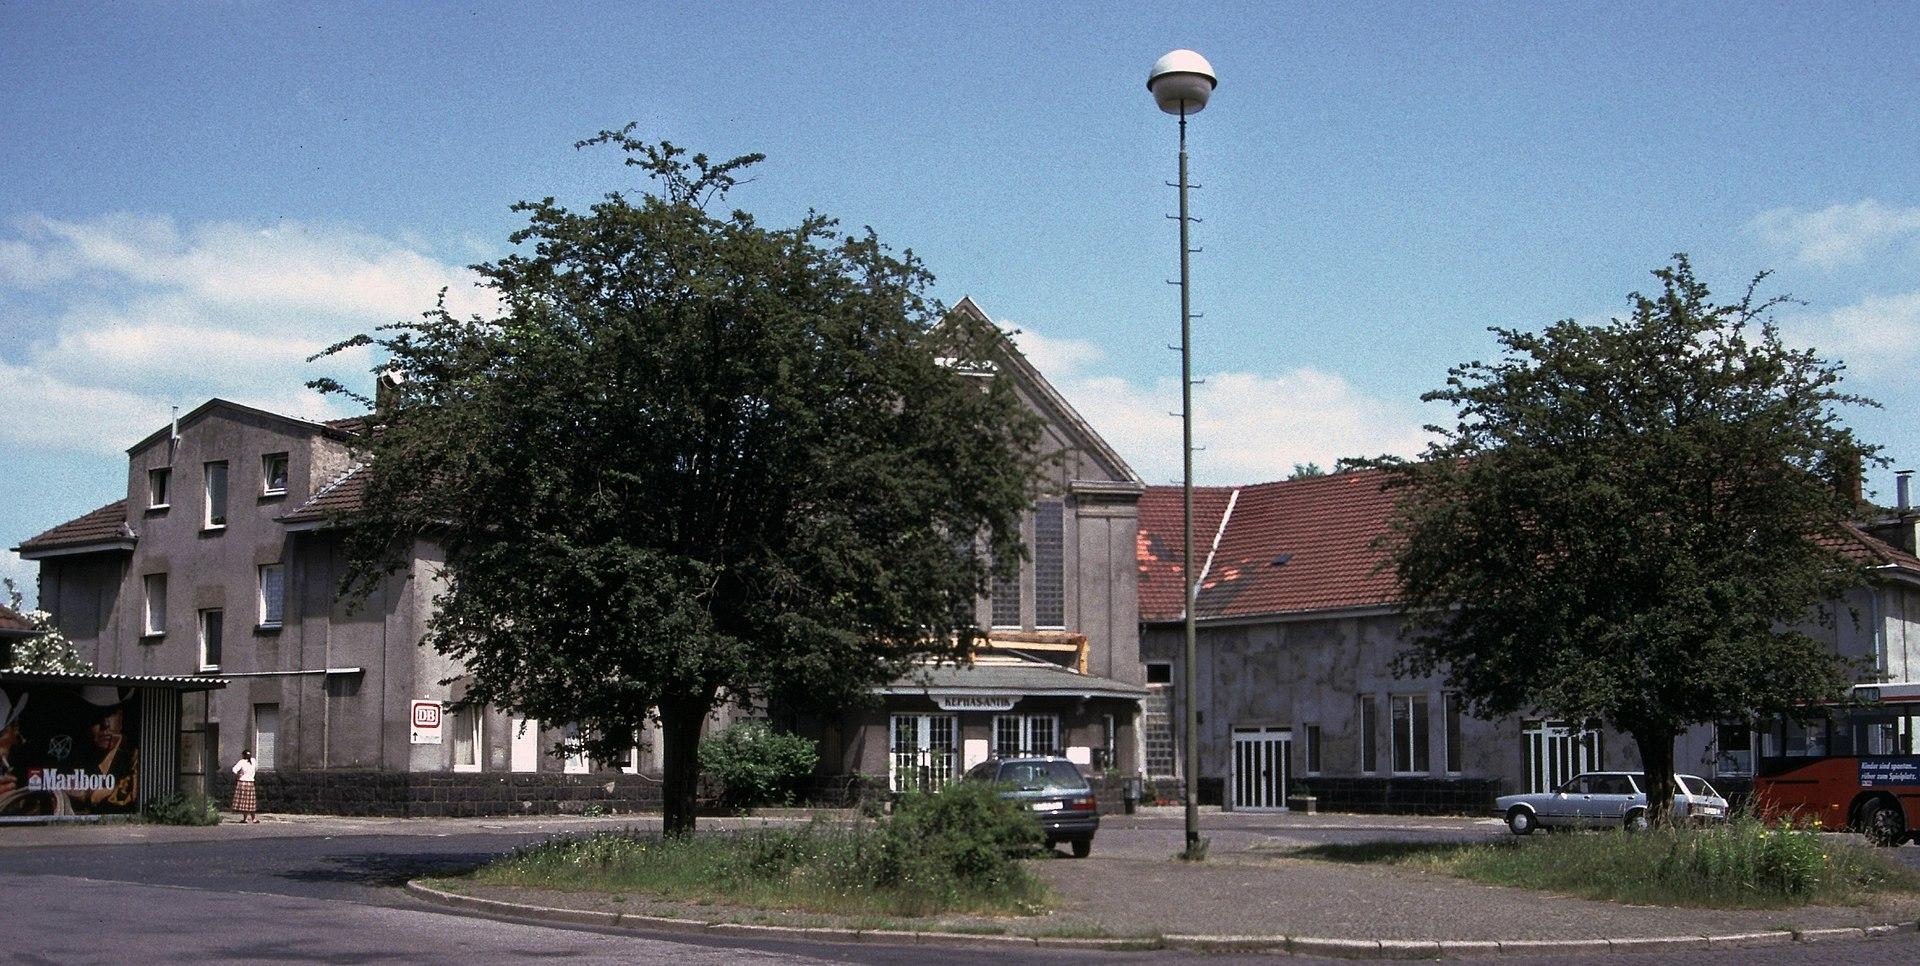 Dorsten Hervest